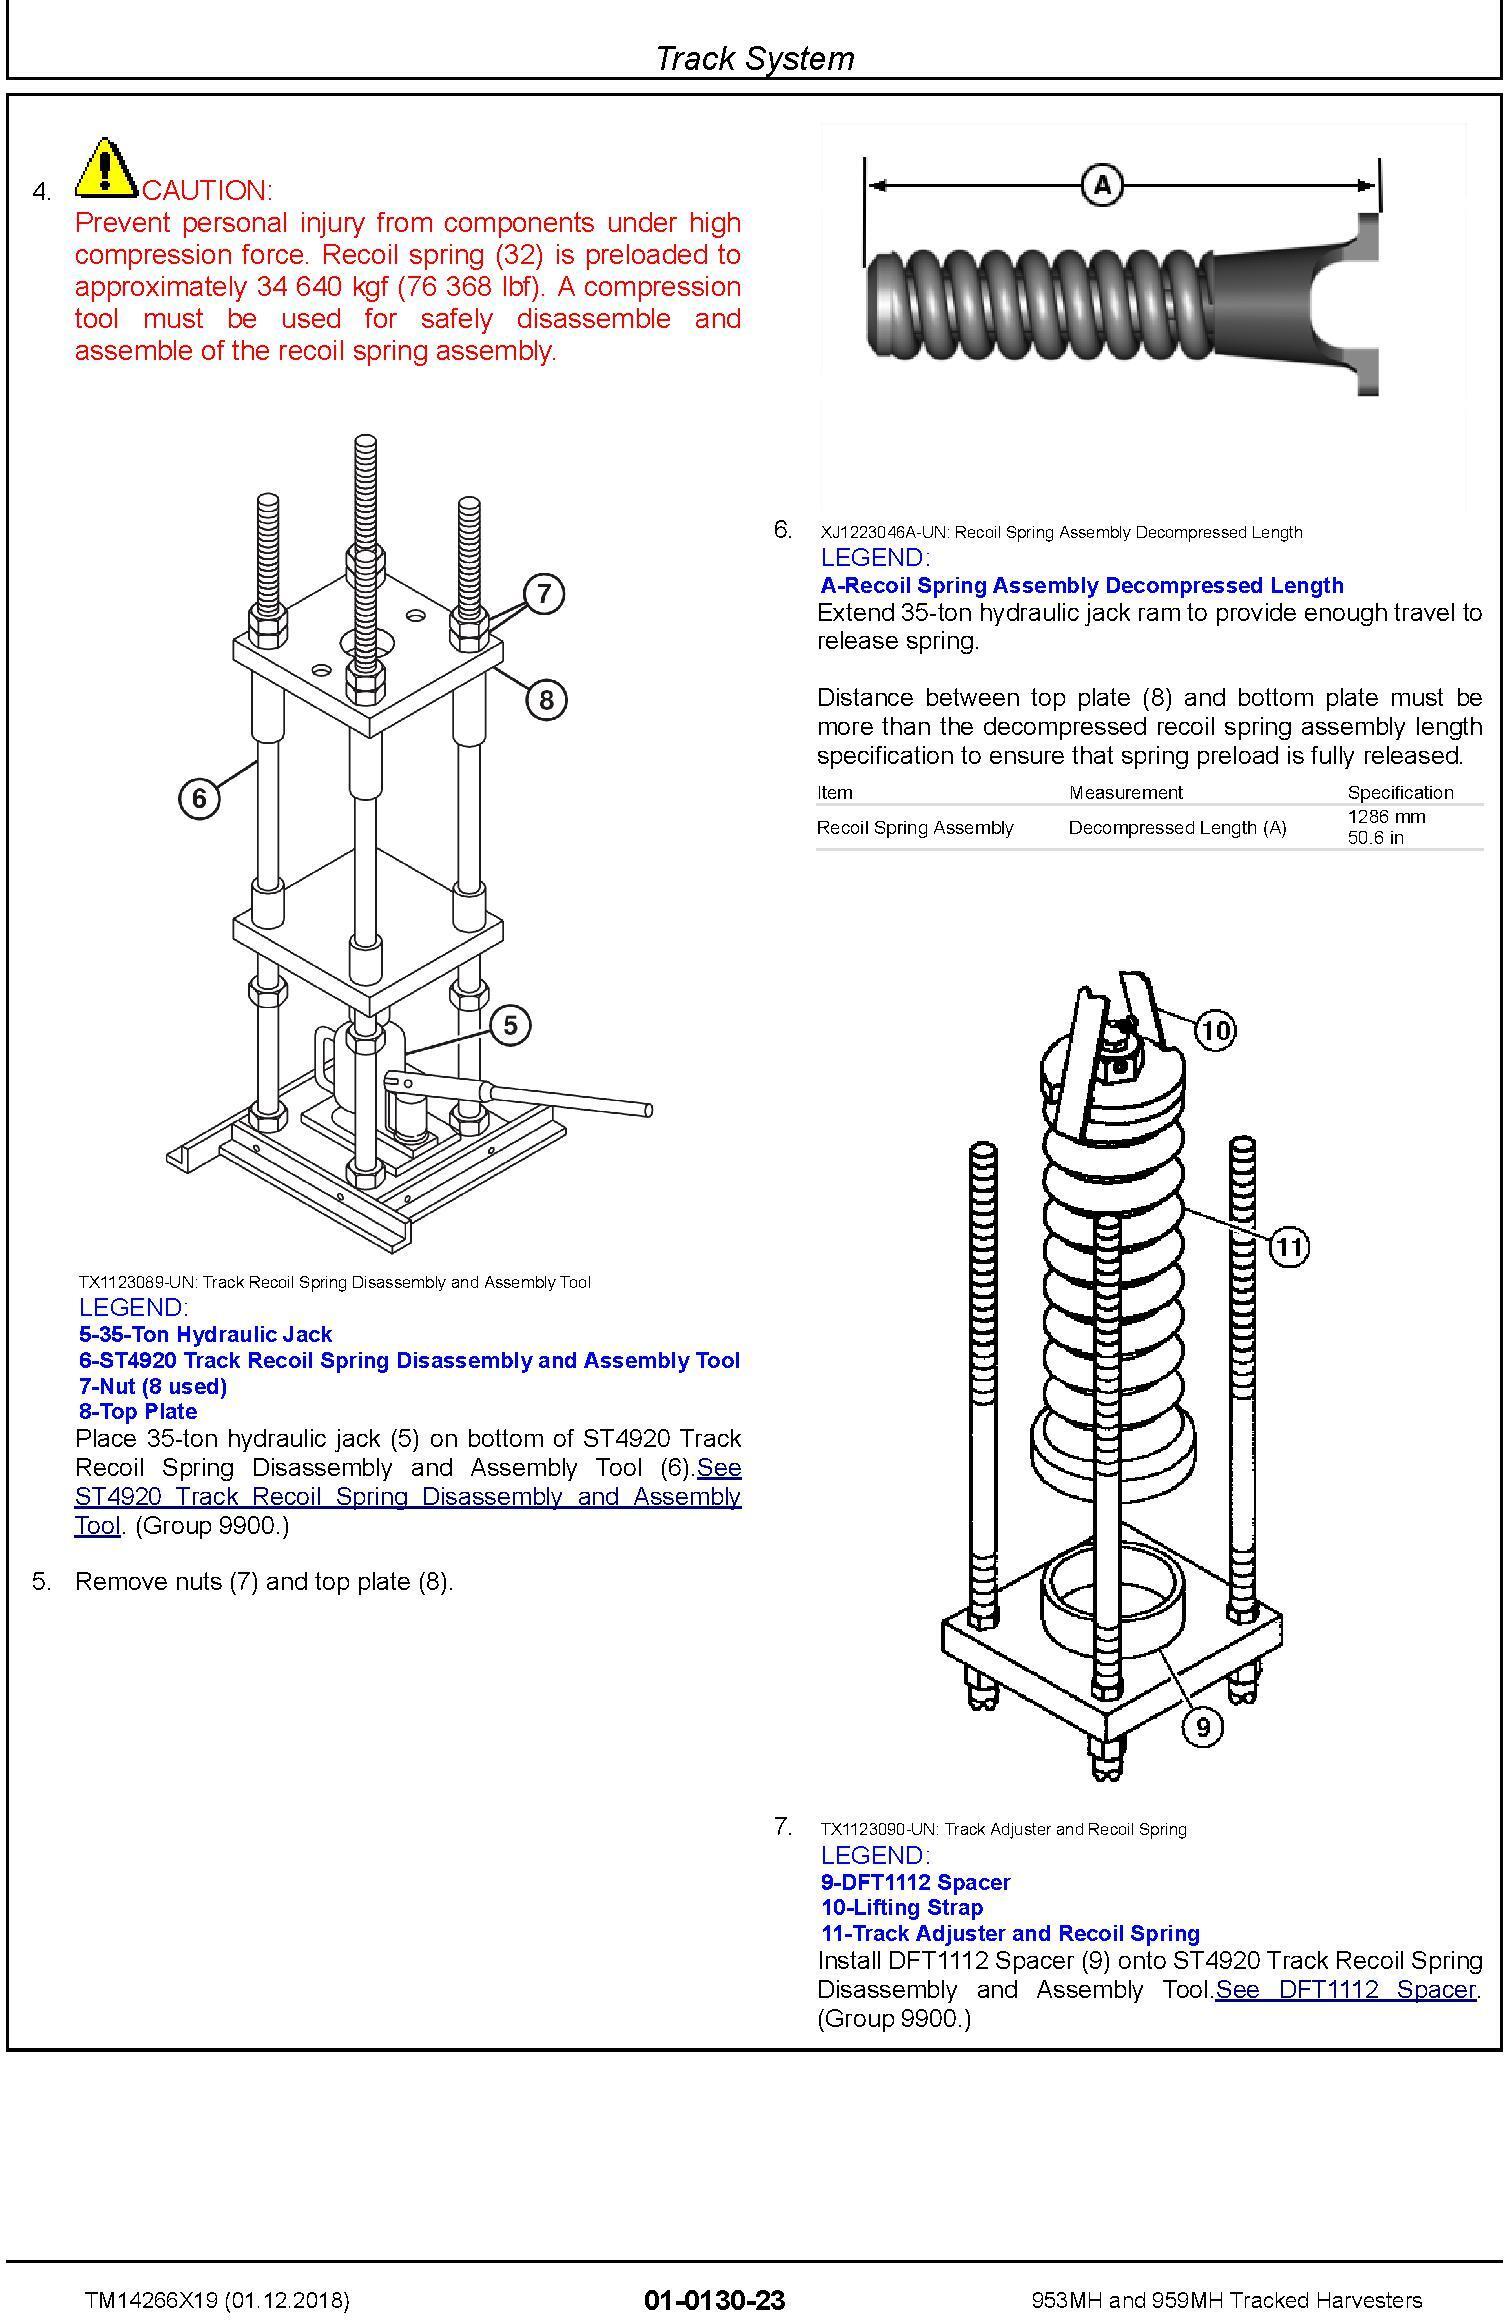 John Deere 953MH, 959MH (SN.F317982-,L317982-) Tracked Harvesters Service Repair Manual (TM14266X19) - 1